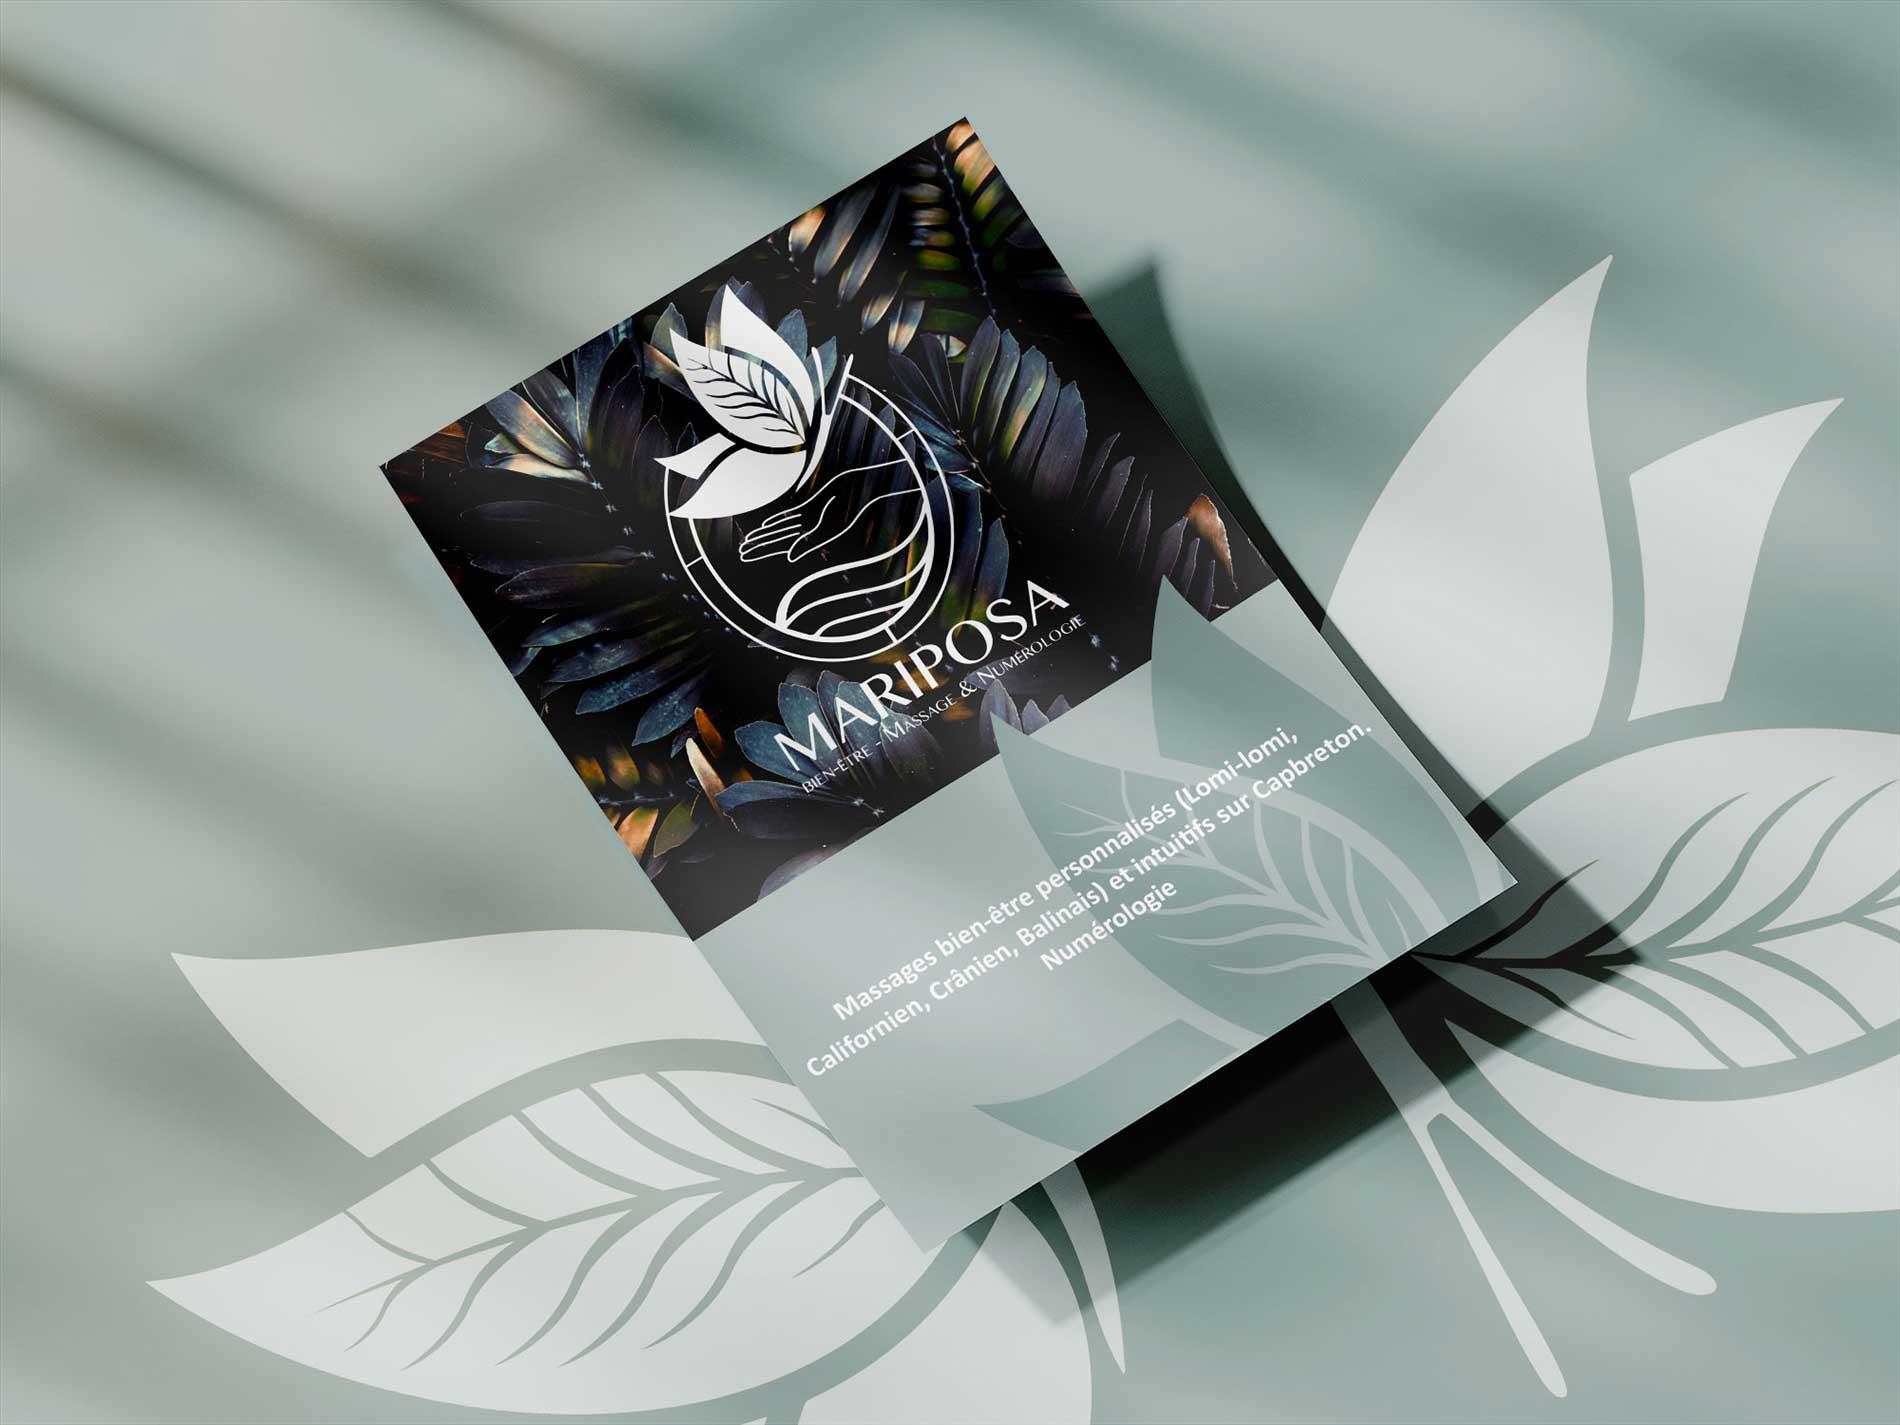 flyer-pub-mariposa-capbreton-bienetre-numerologie-massage-energie-equilibre-40